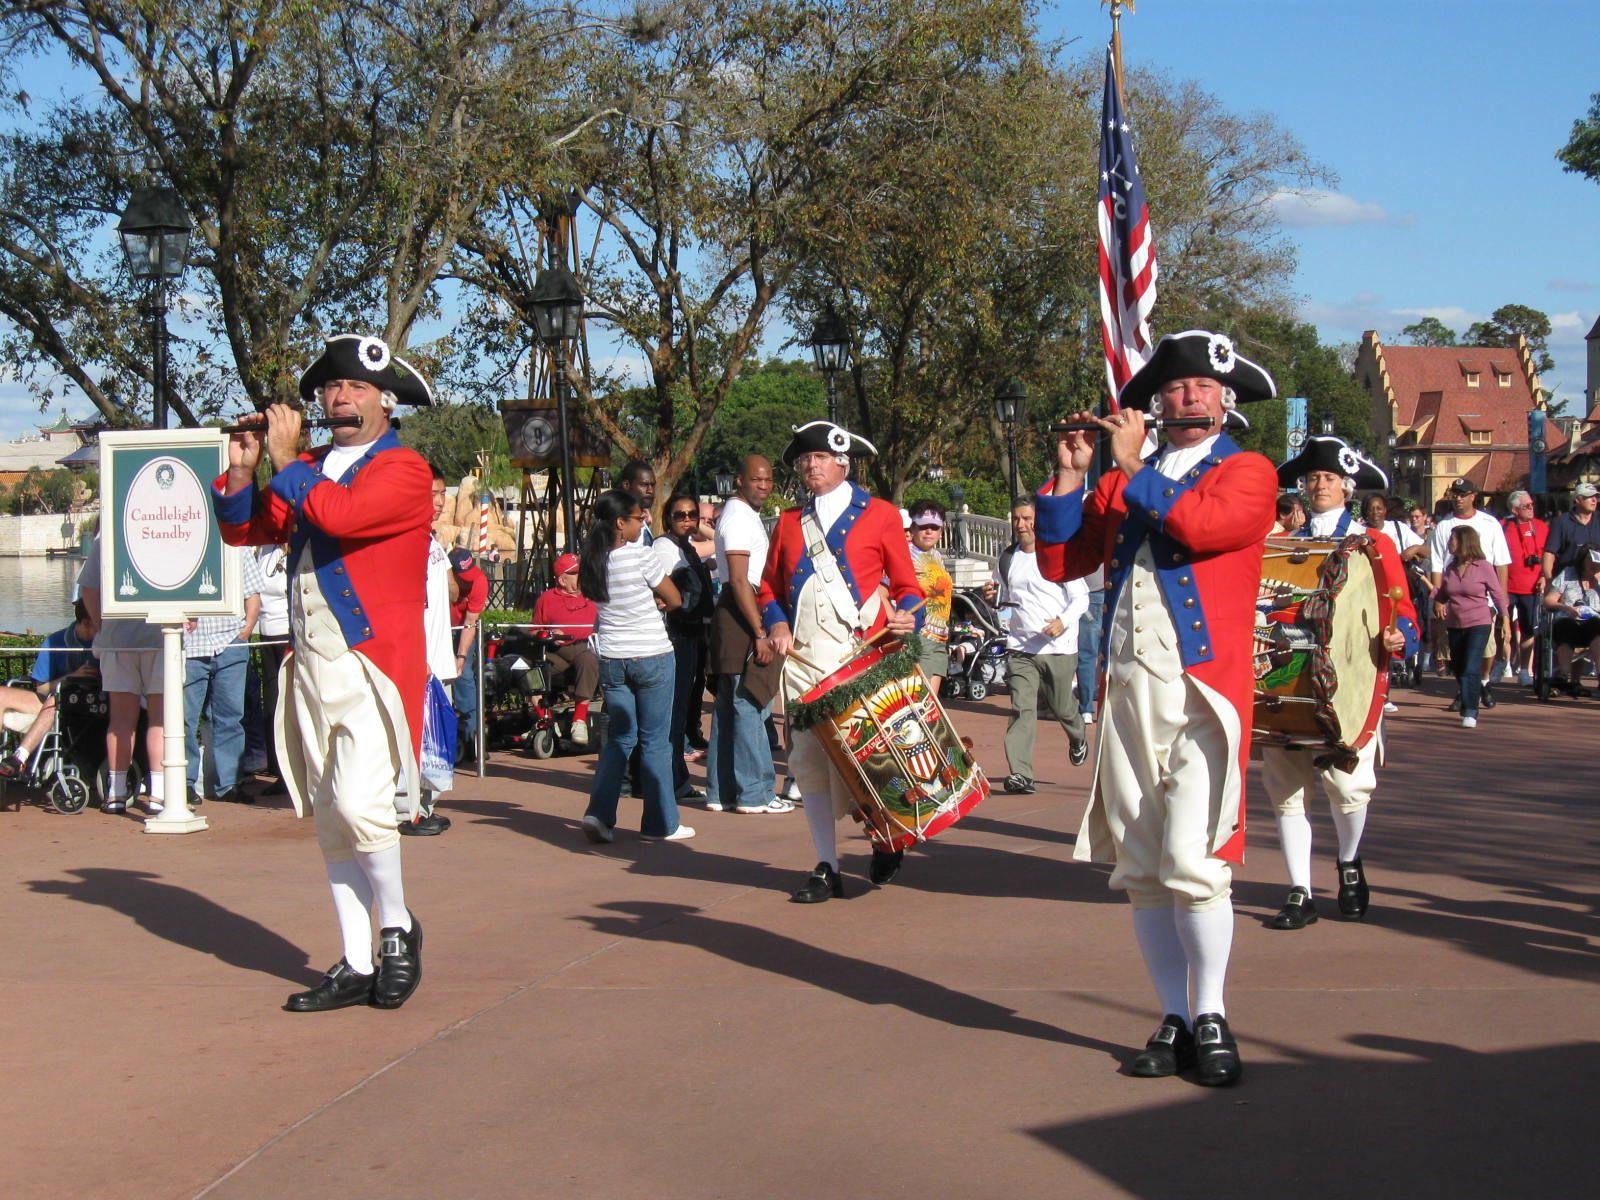 Parade @ Walt Disney World's Epcot - World Showcase - by Jamie Benny 2008